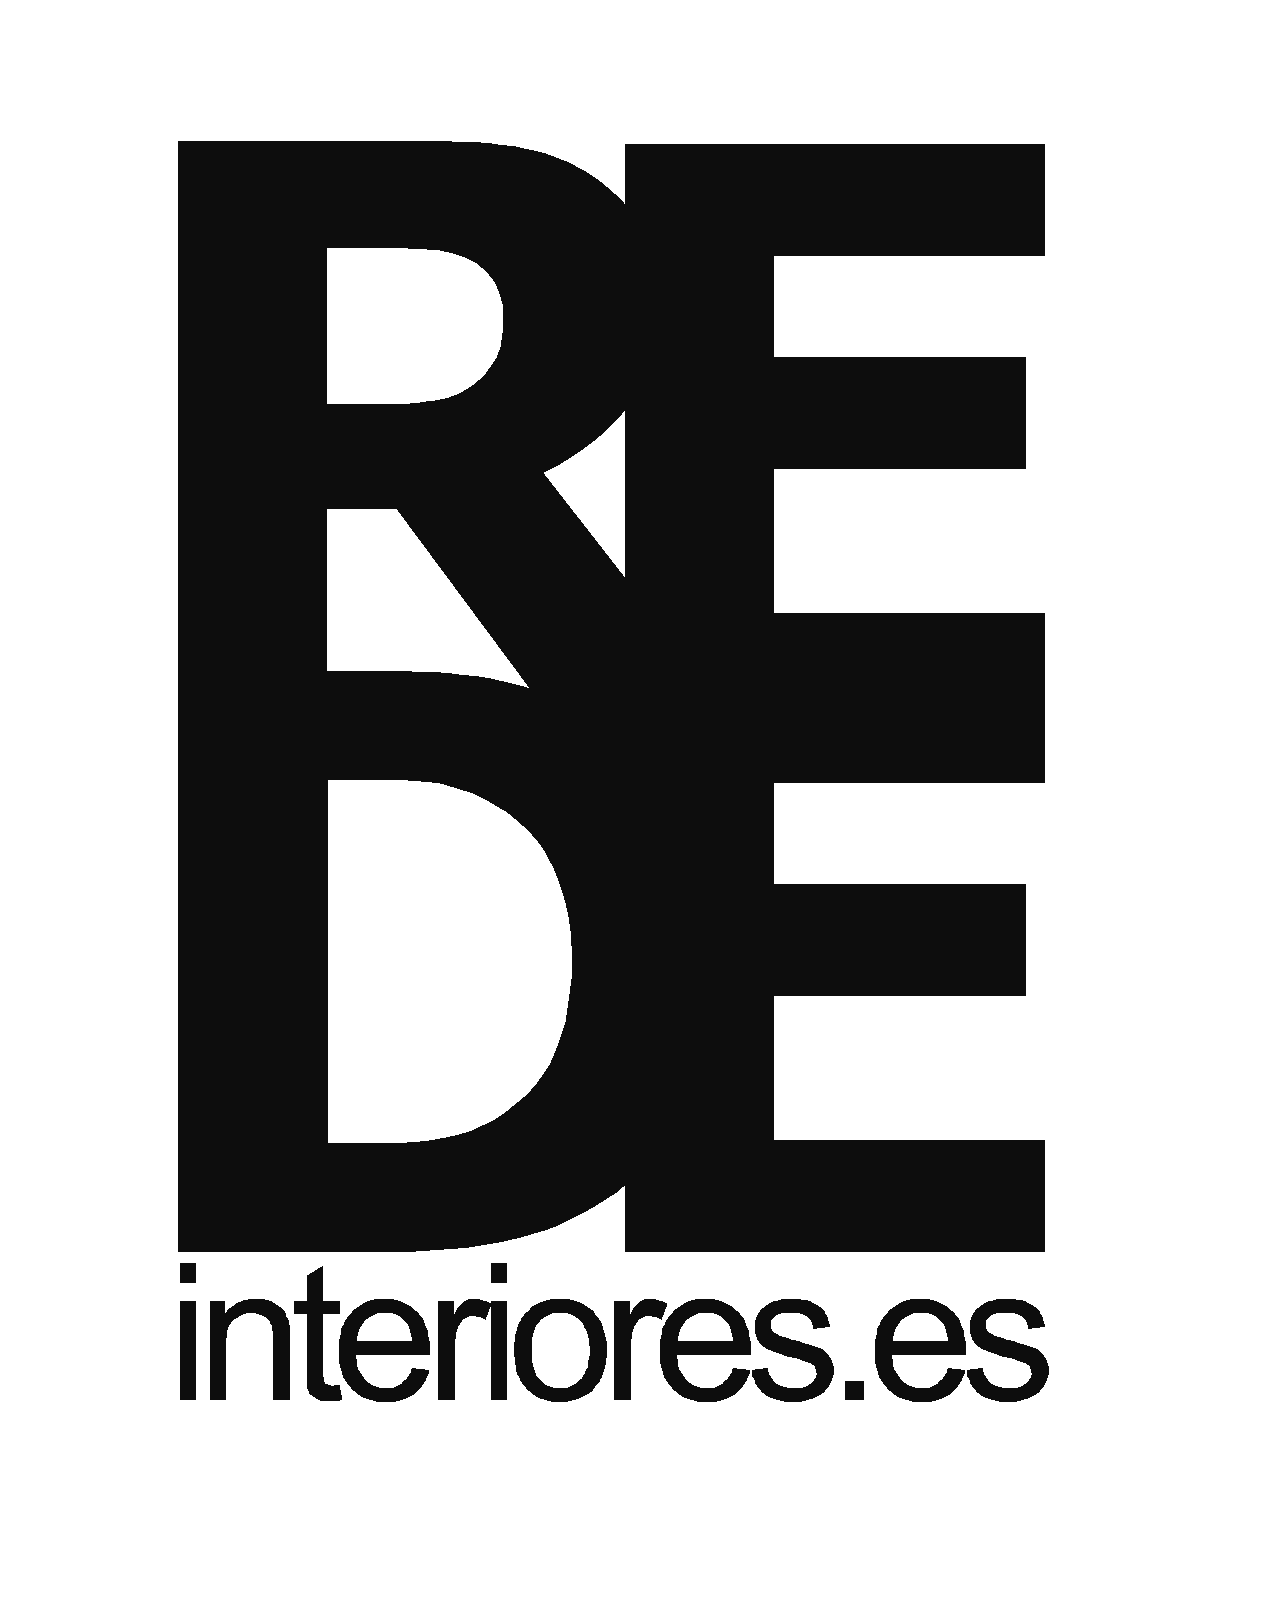 Rede Interiores